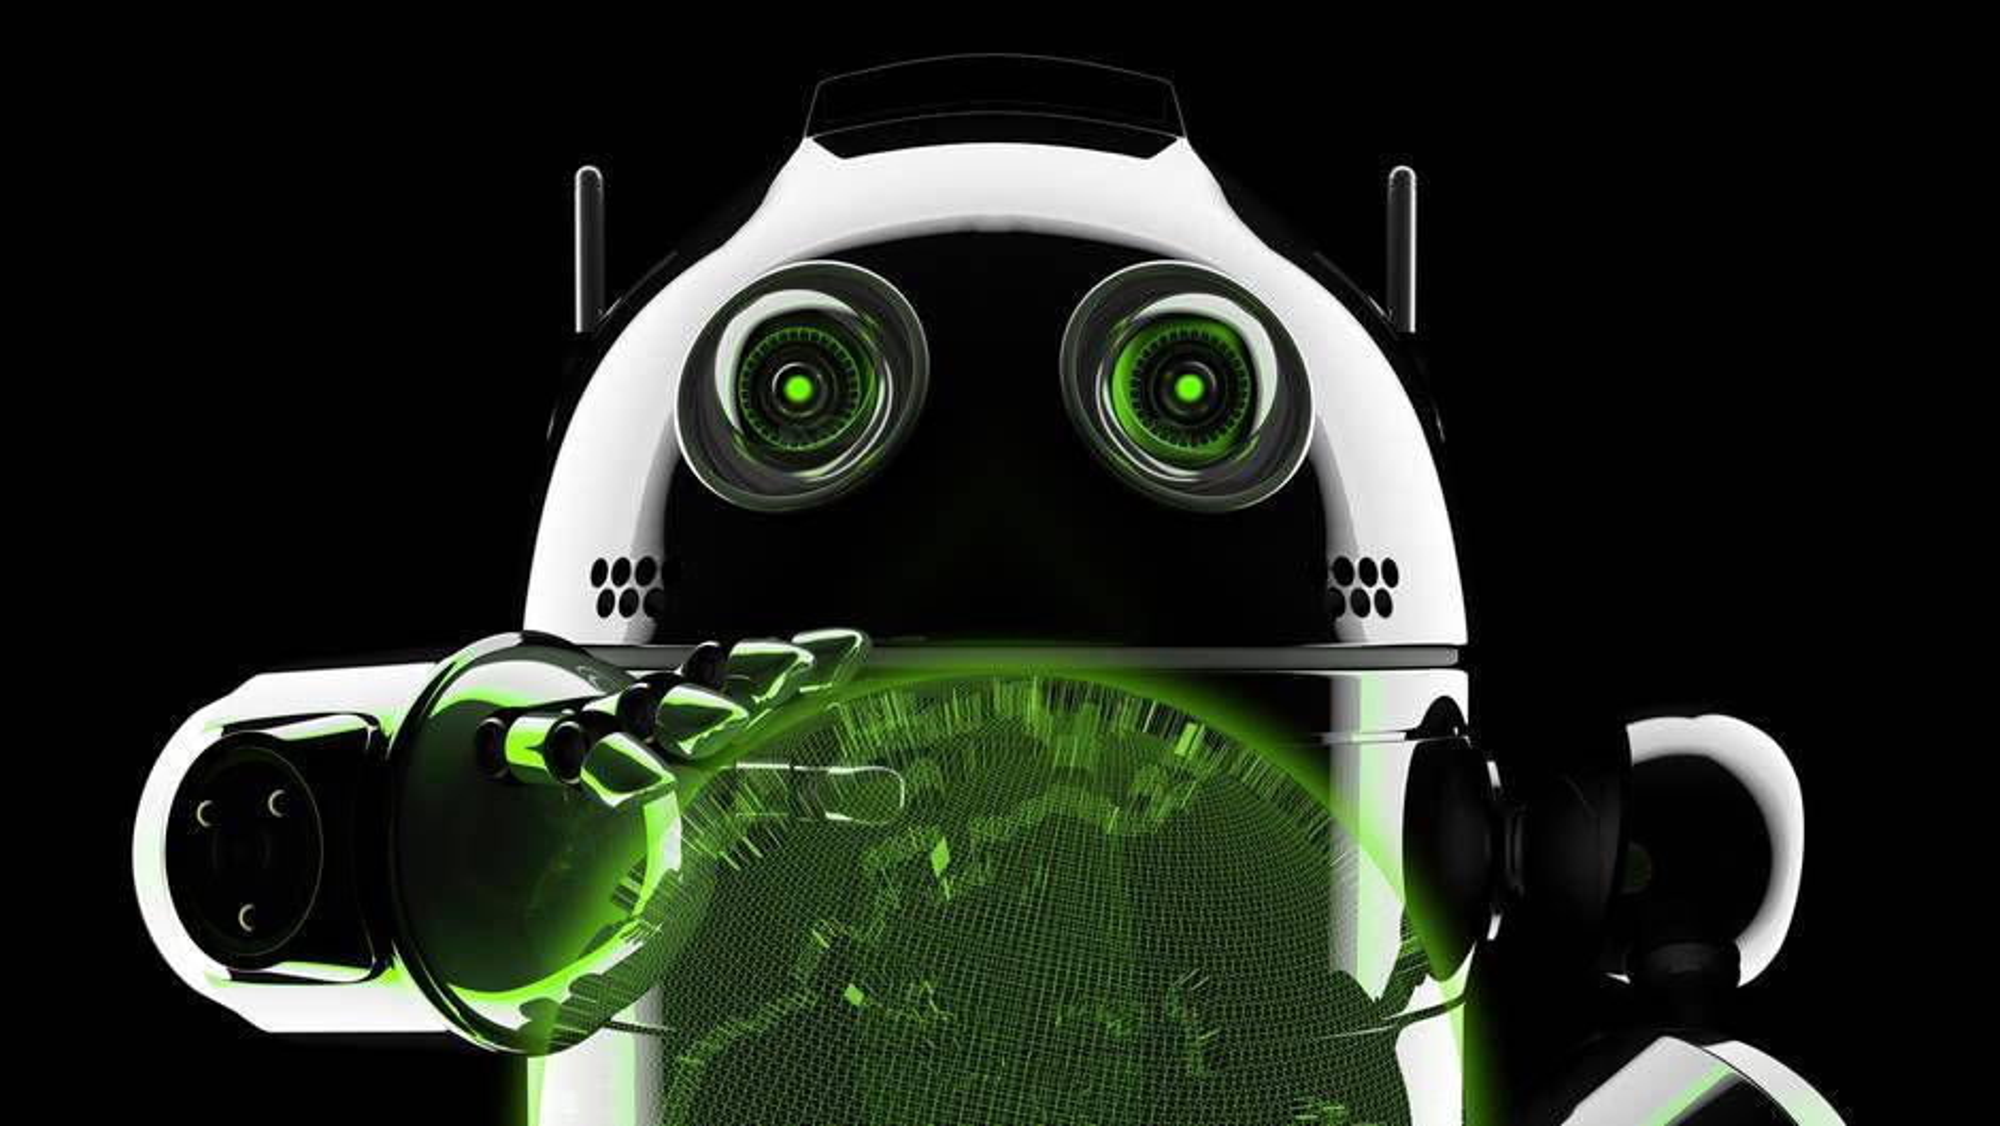 Ny rapport: 4 av 5 bruker Android